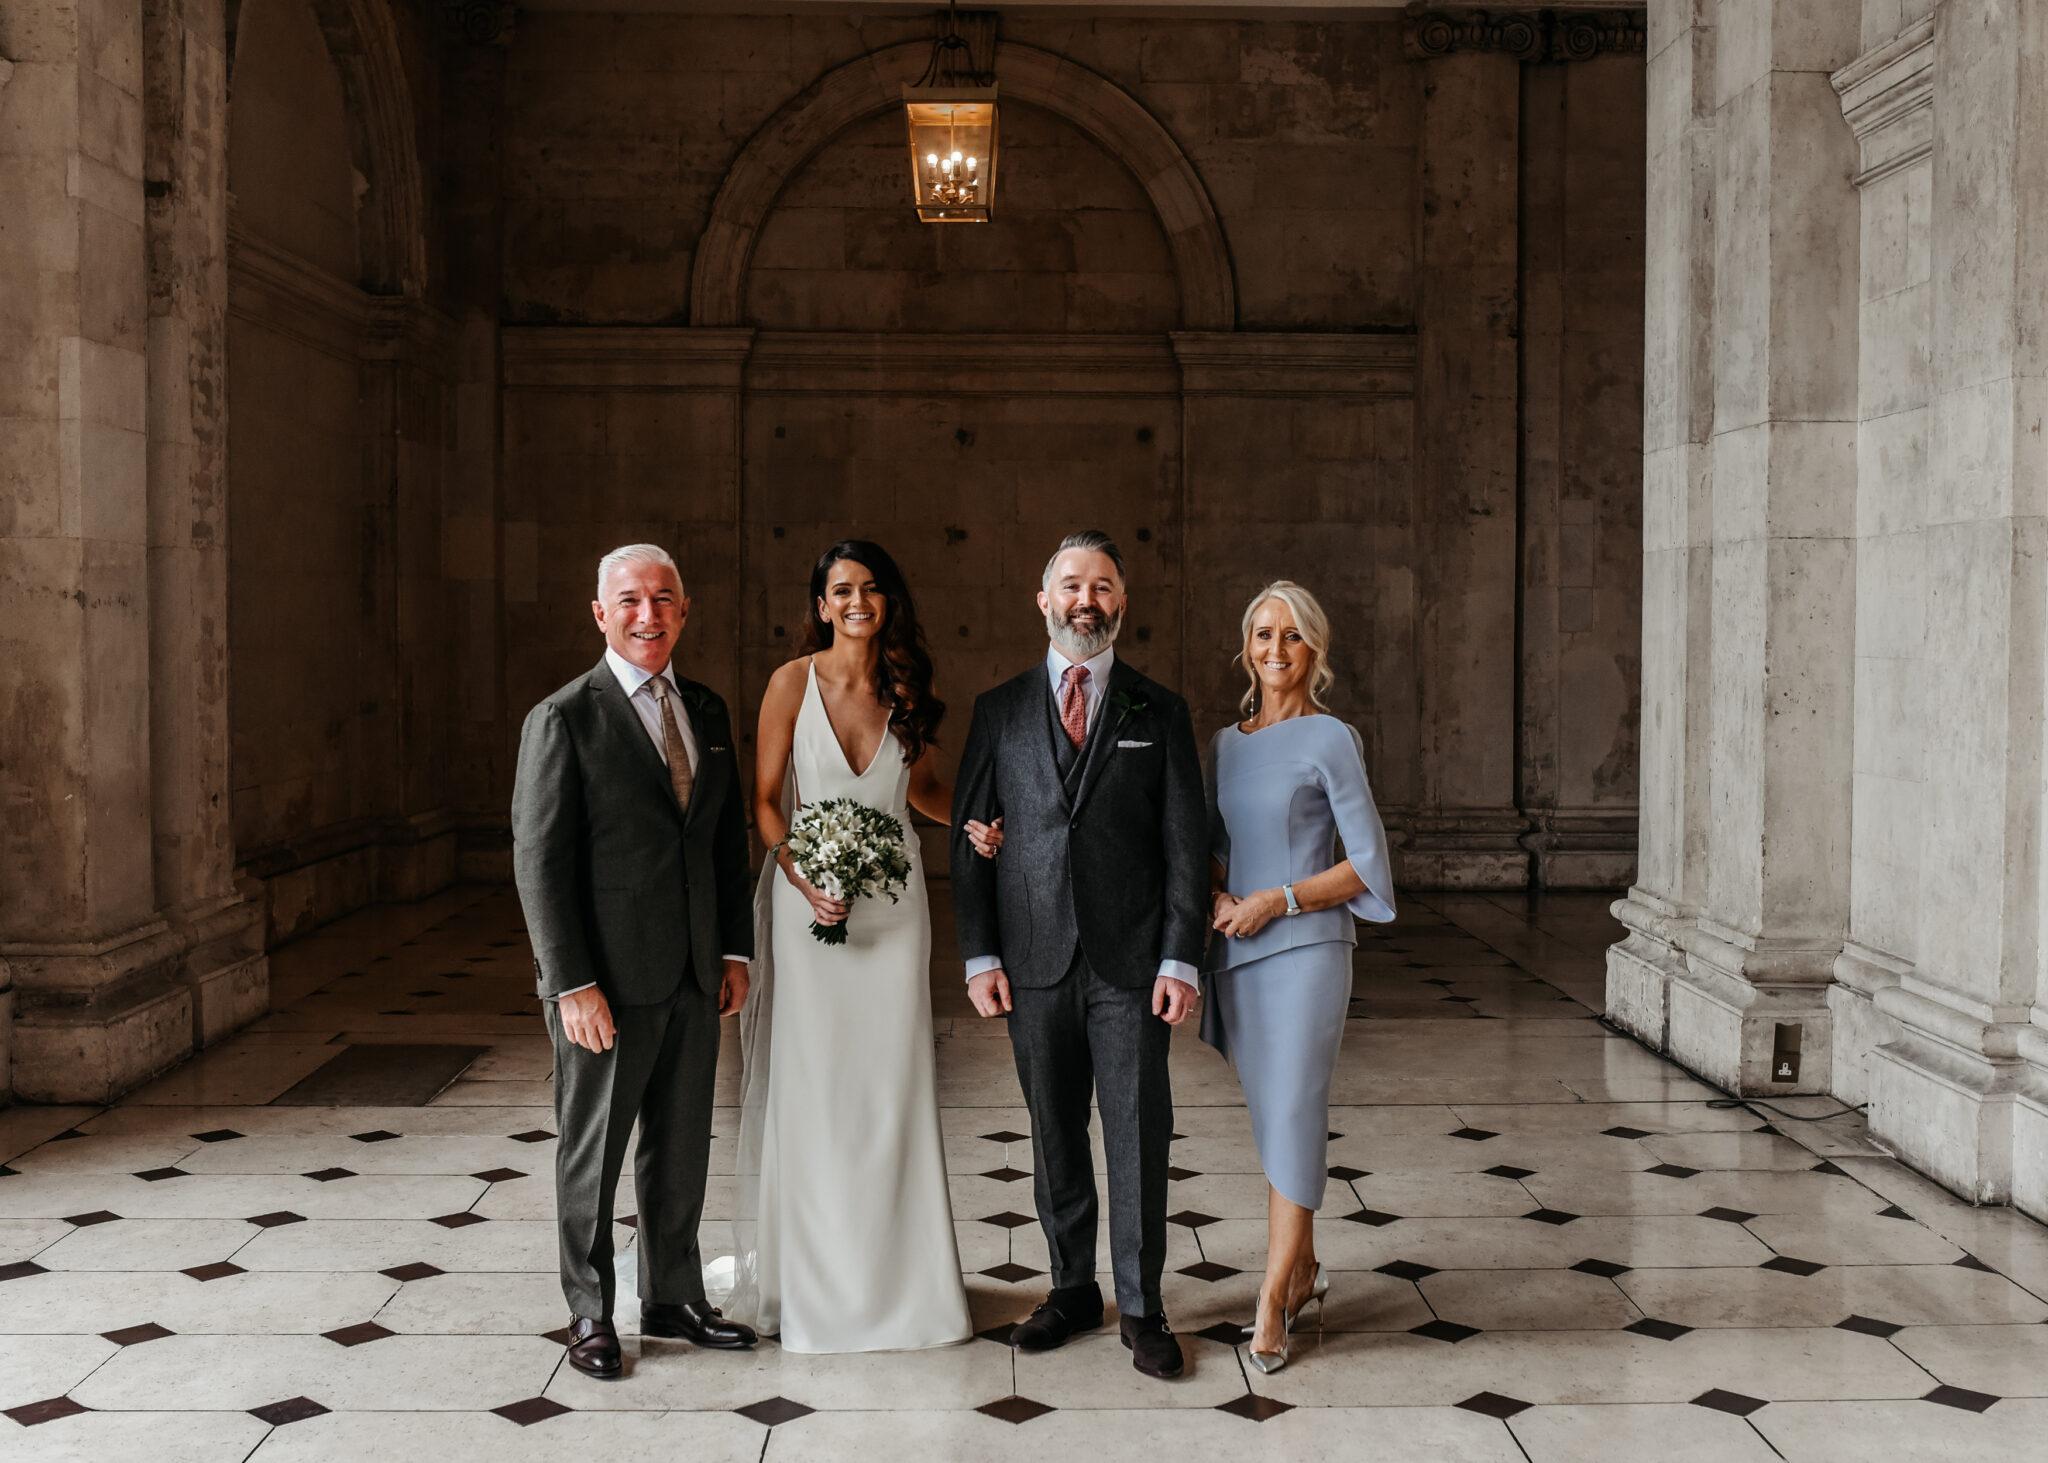 City Hall Wedding Photos Intercontinental Hotel Dublin 19